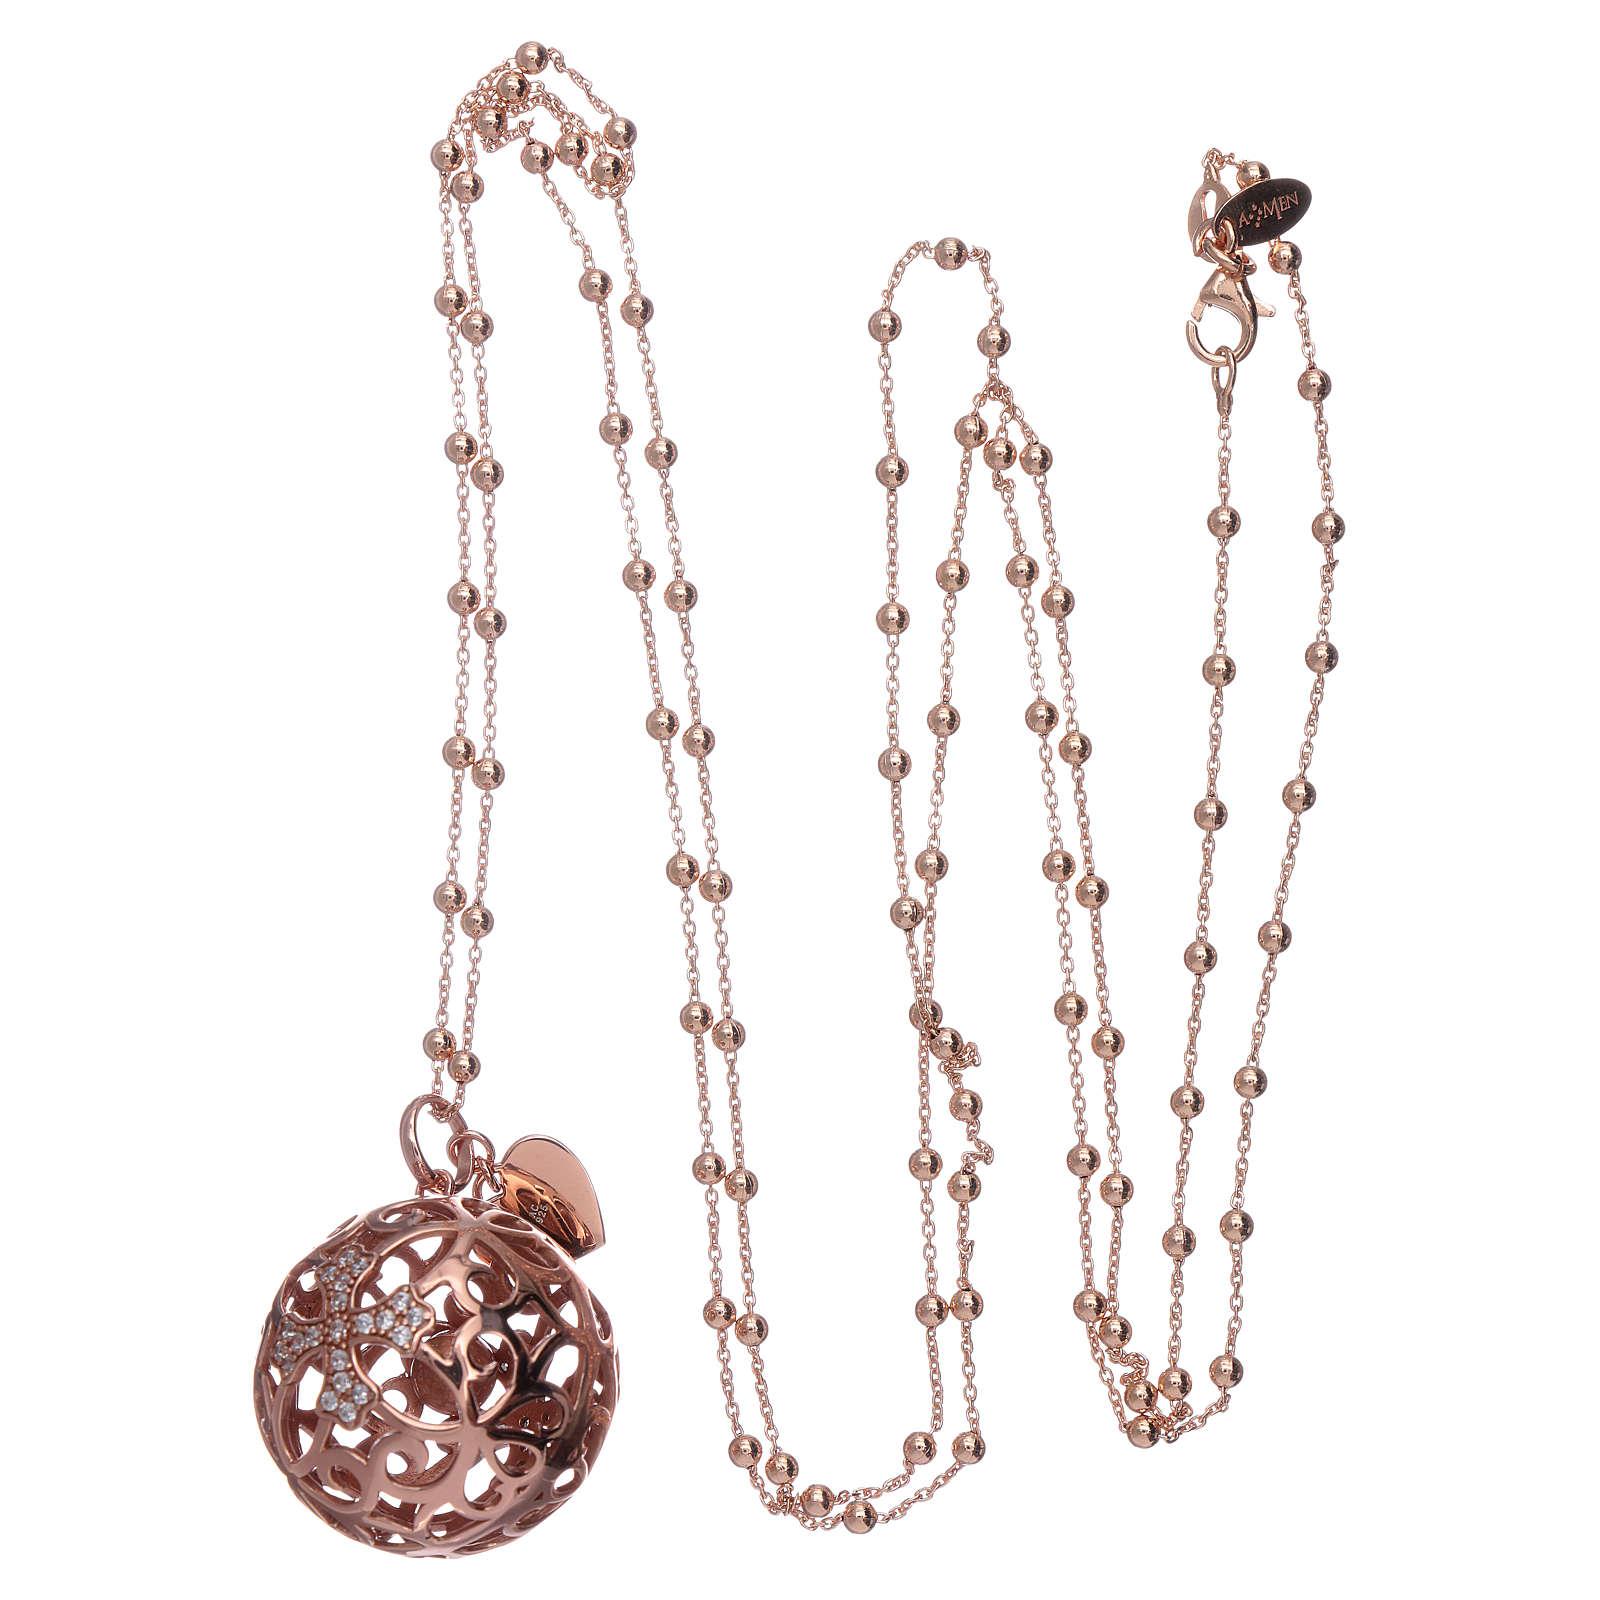 Collier harmony ball AMEN argent 925 rosé et zircons 4